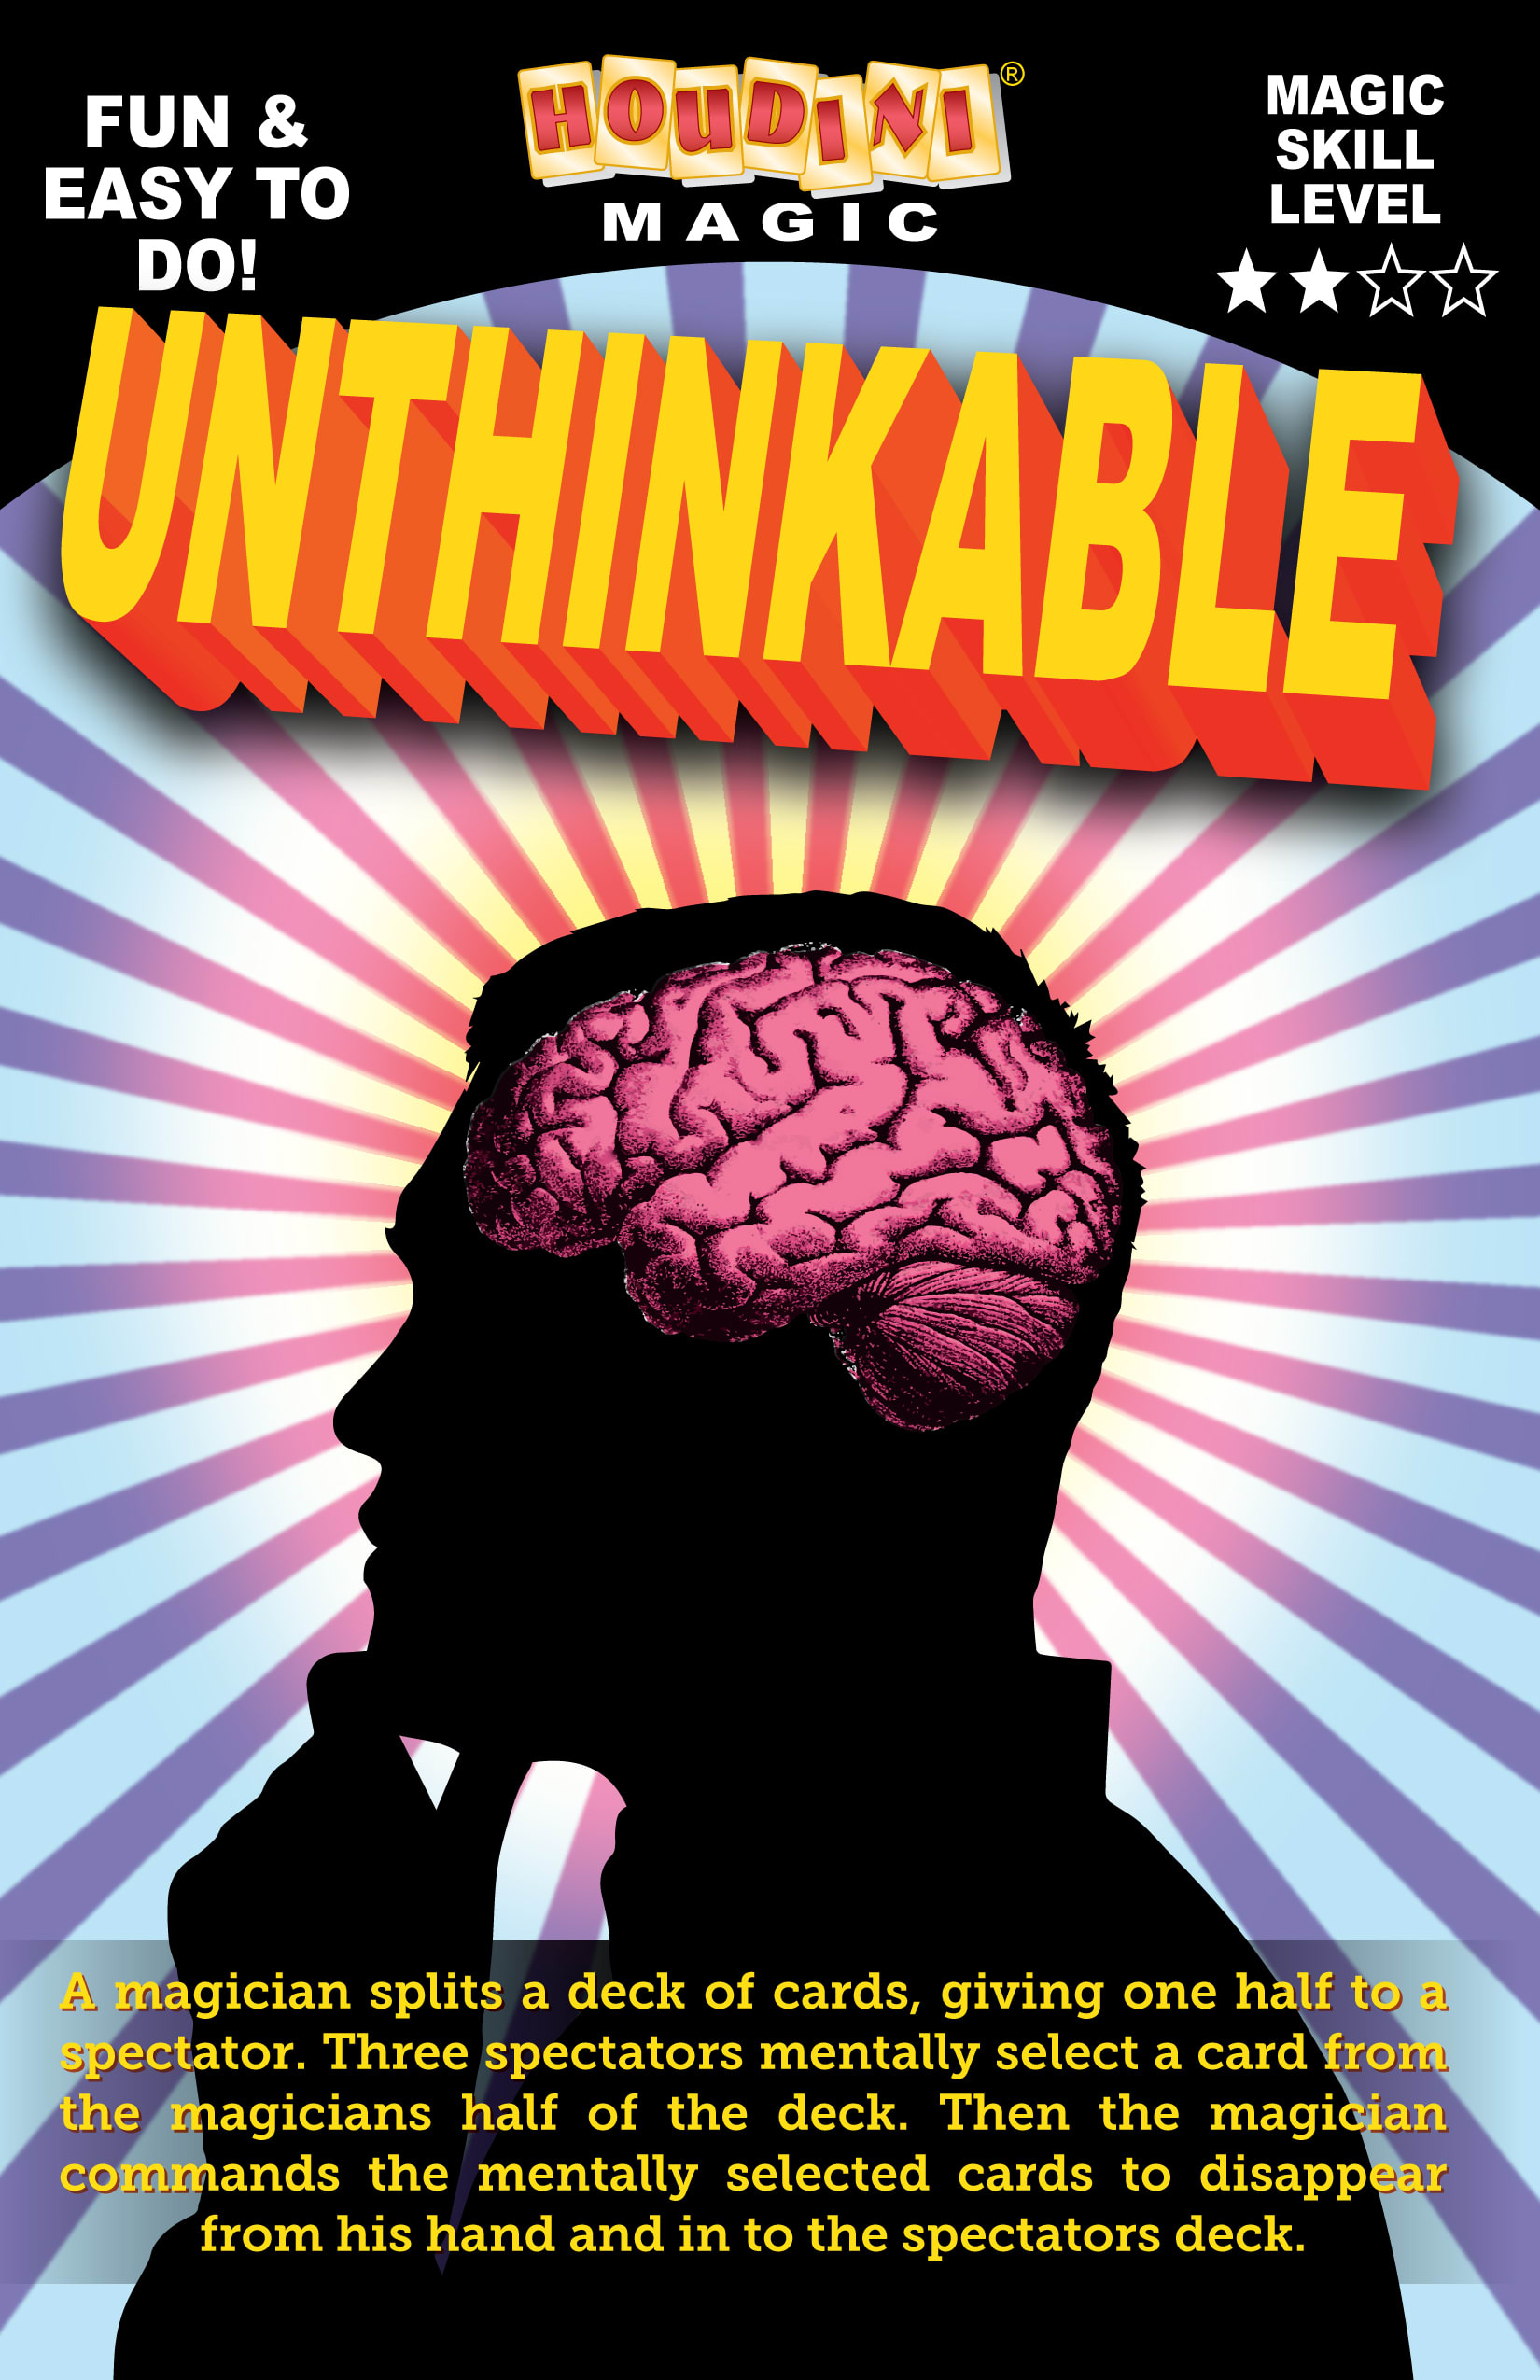 Unthinkable - Teaching DVL